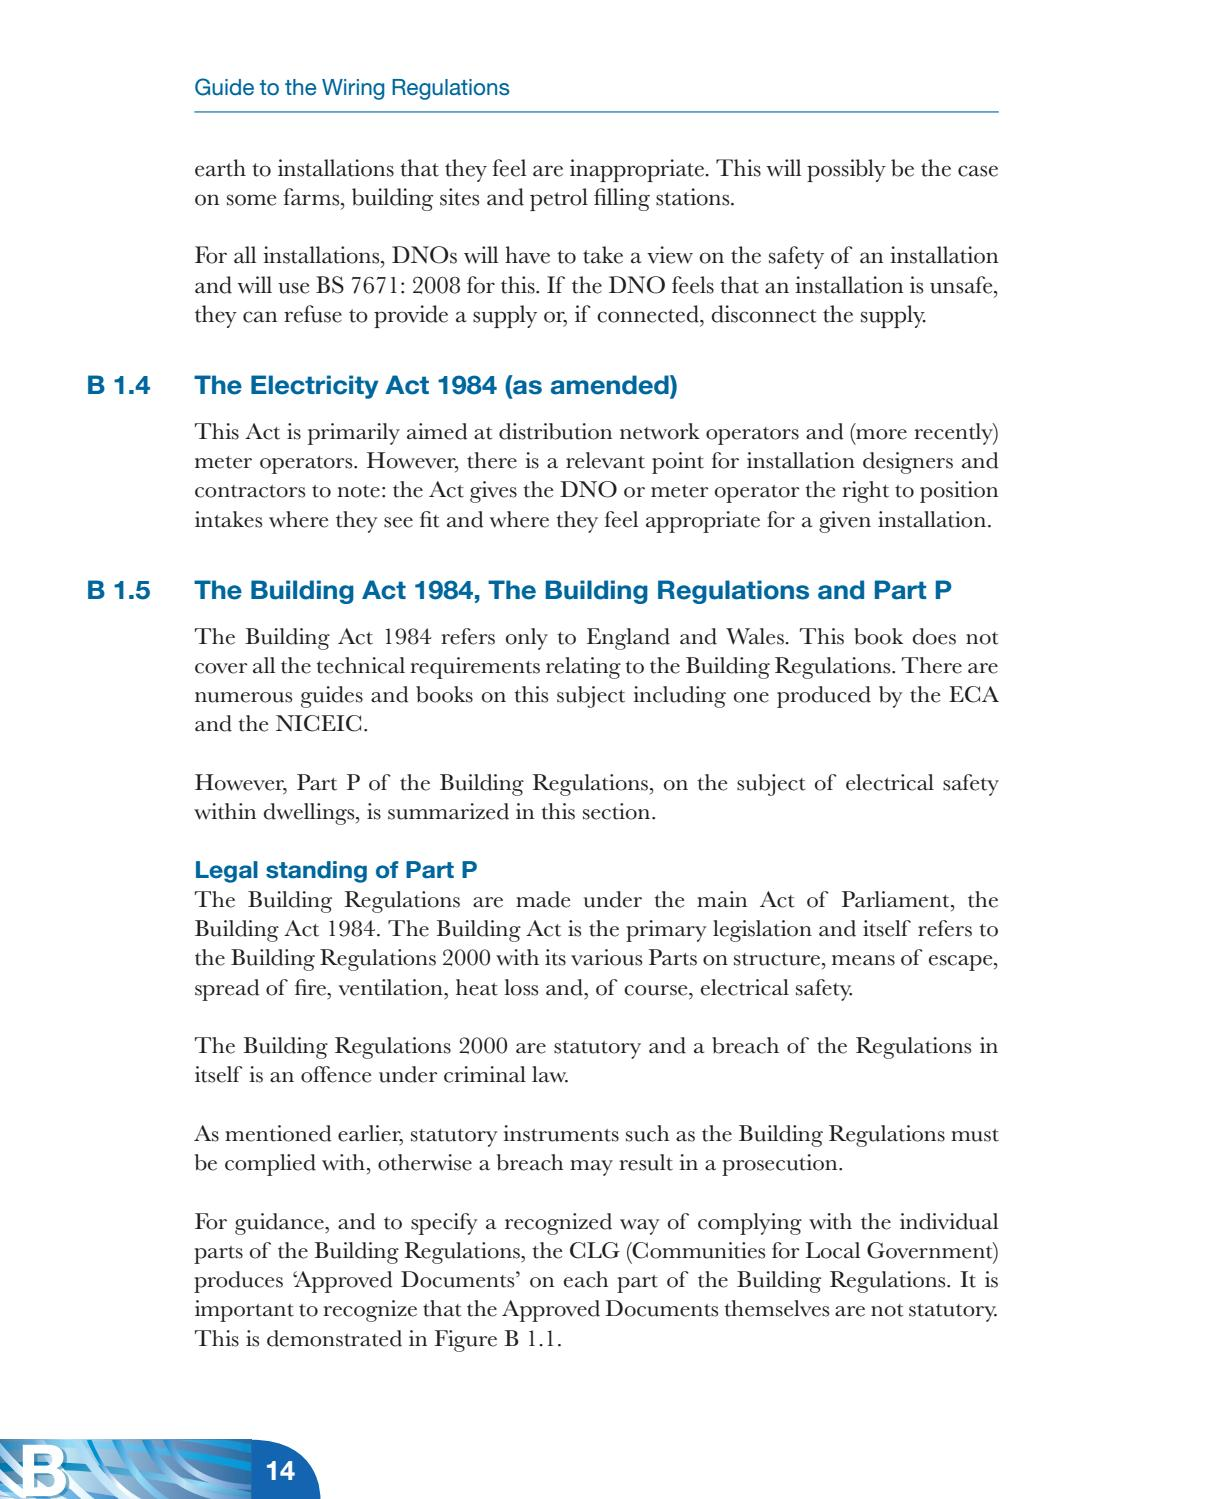 17th edition IEE wiring regulations by Kanaga Gnana - issuu on